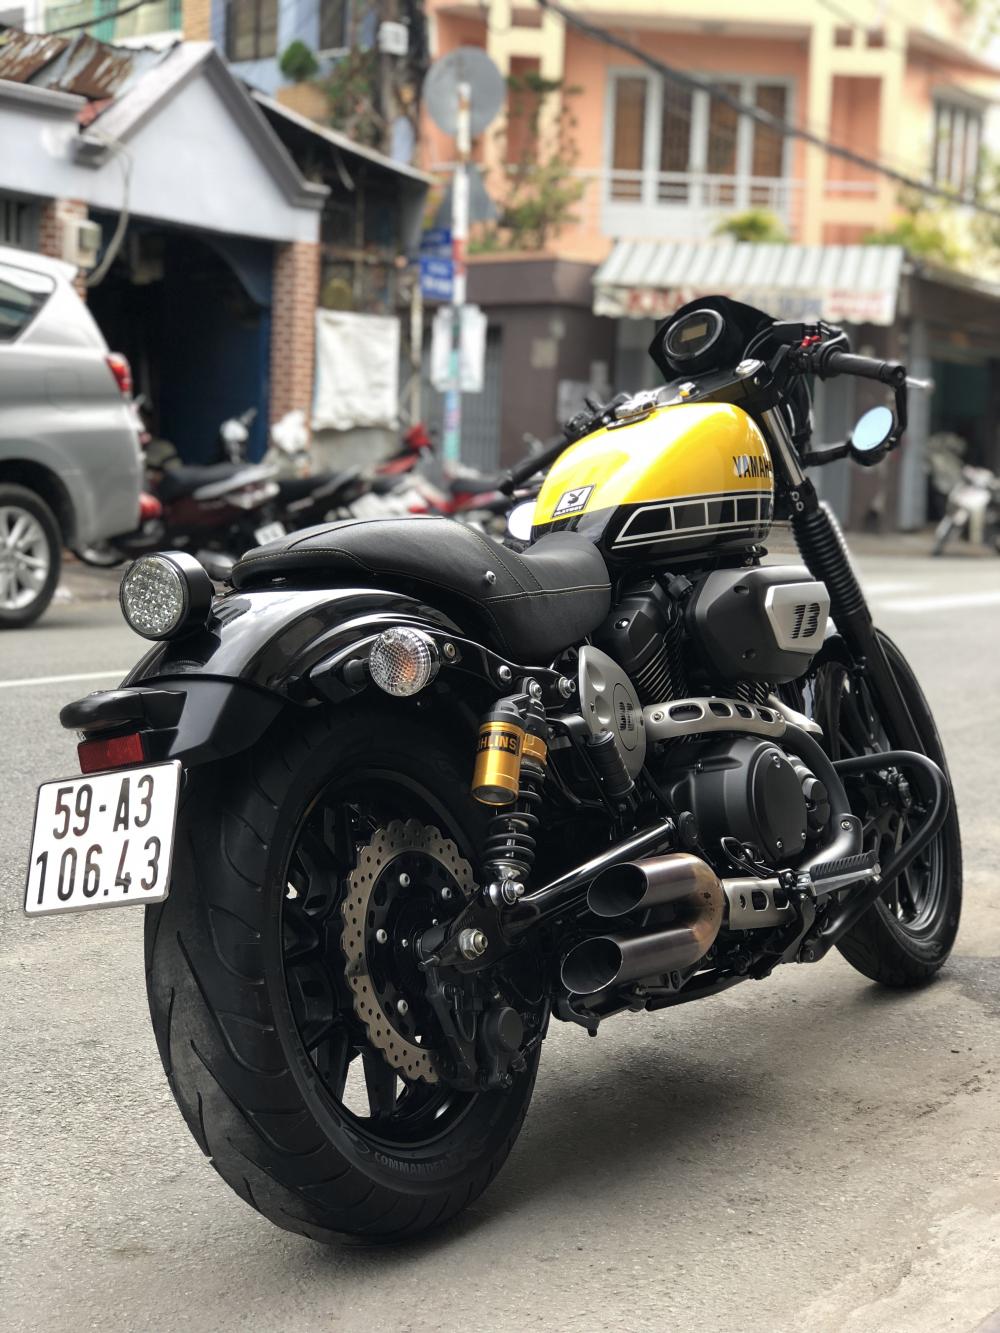 __Can Ban Yamaha XV950 Racer 2016 ban mau vang dac biet ky niem 60th Anniversary thang ABS 122016 - 4